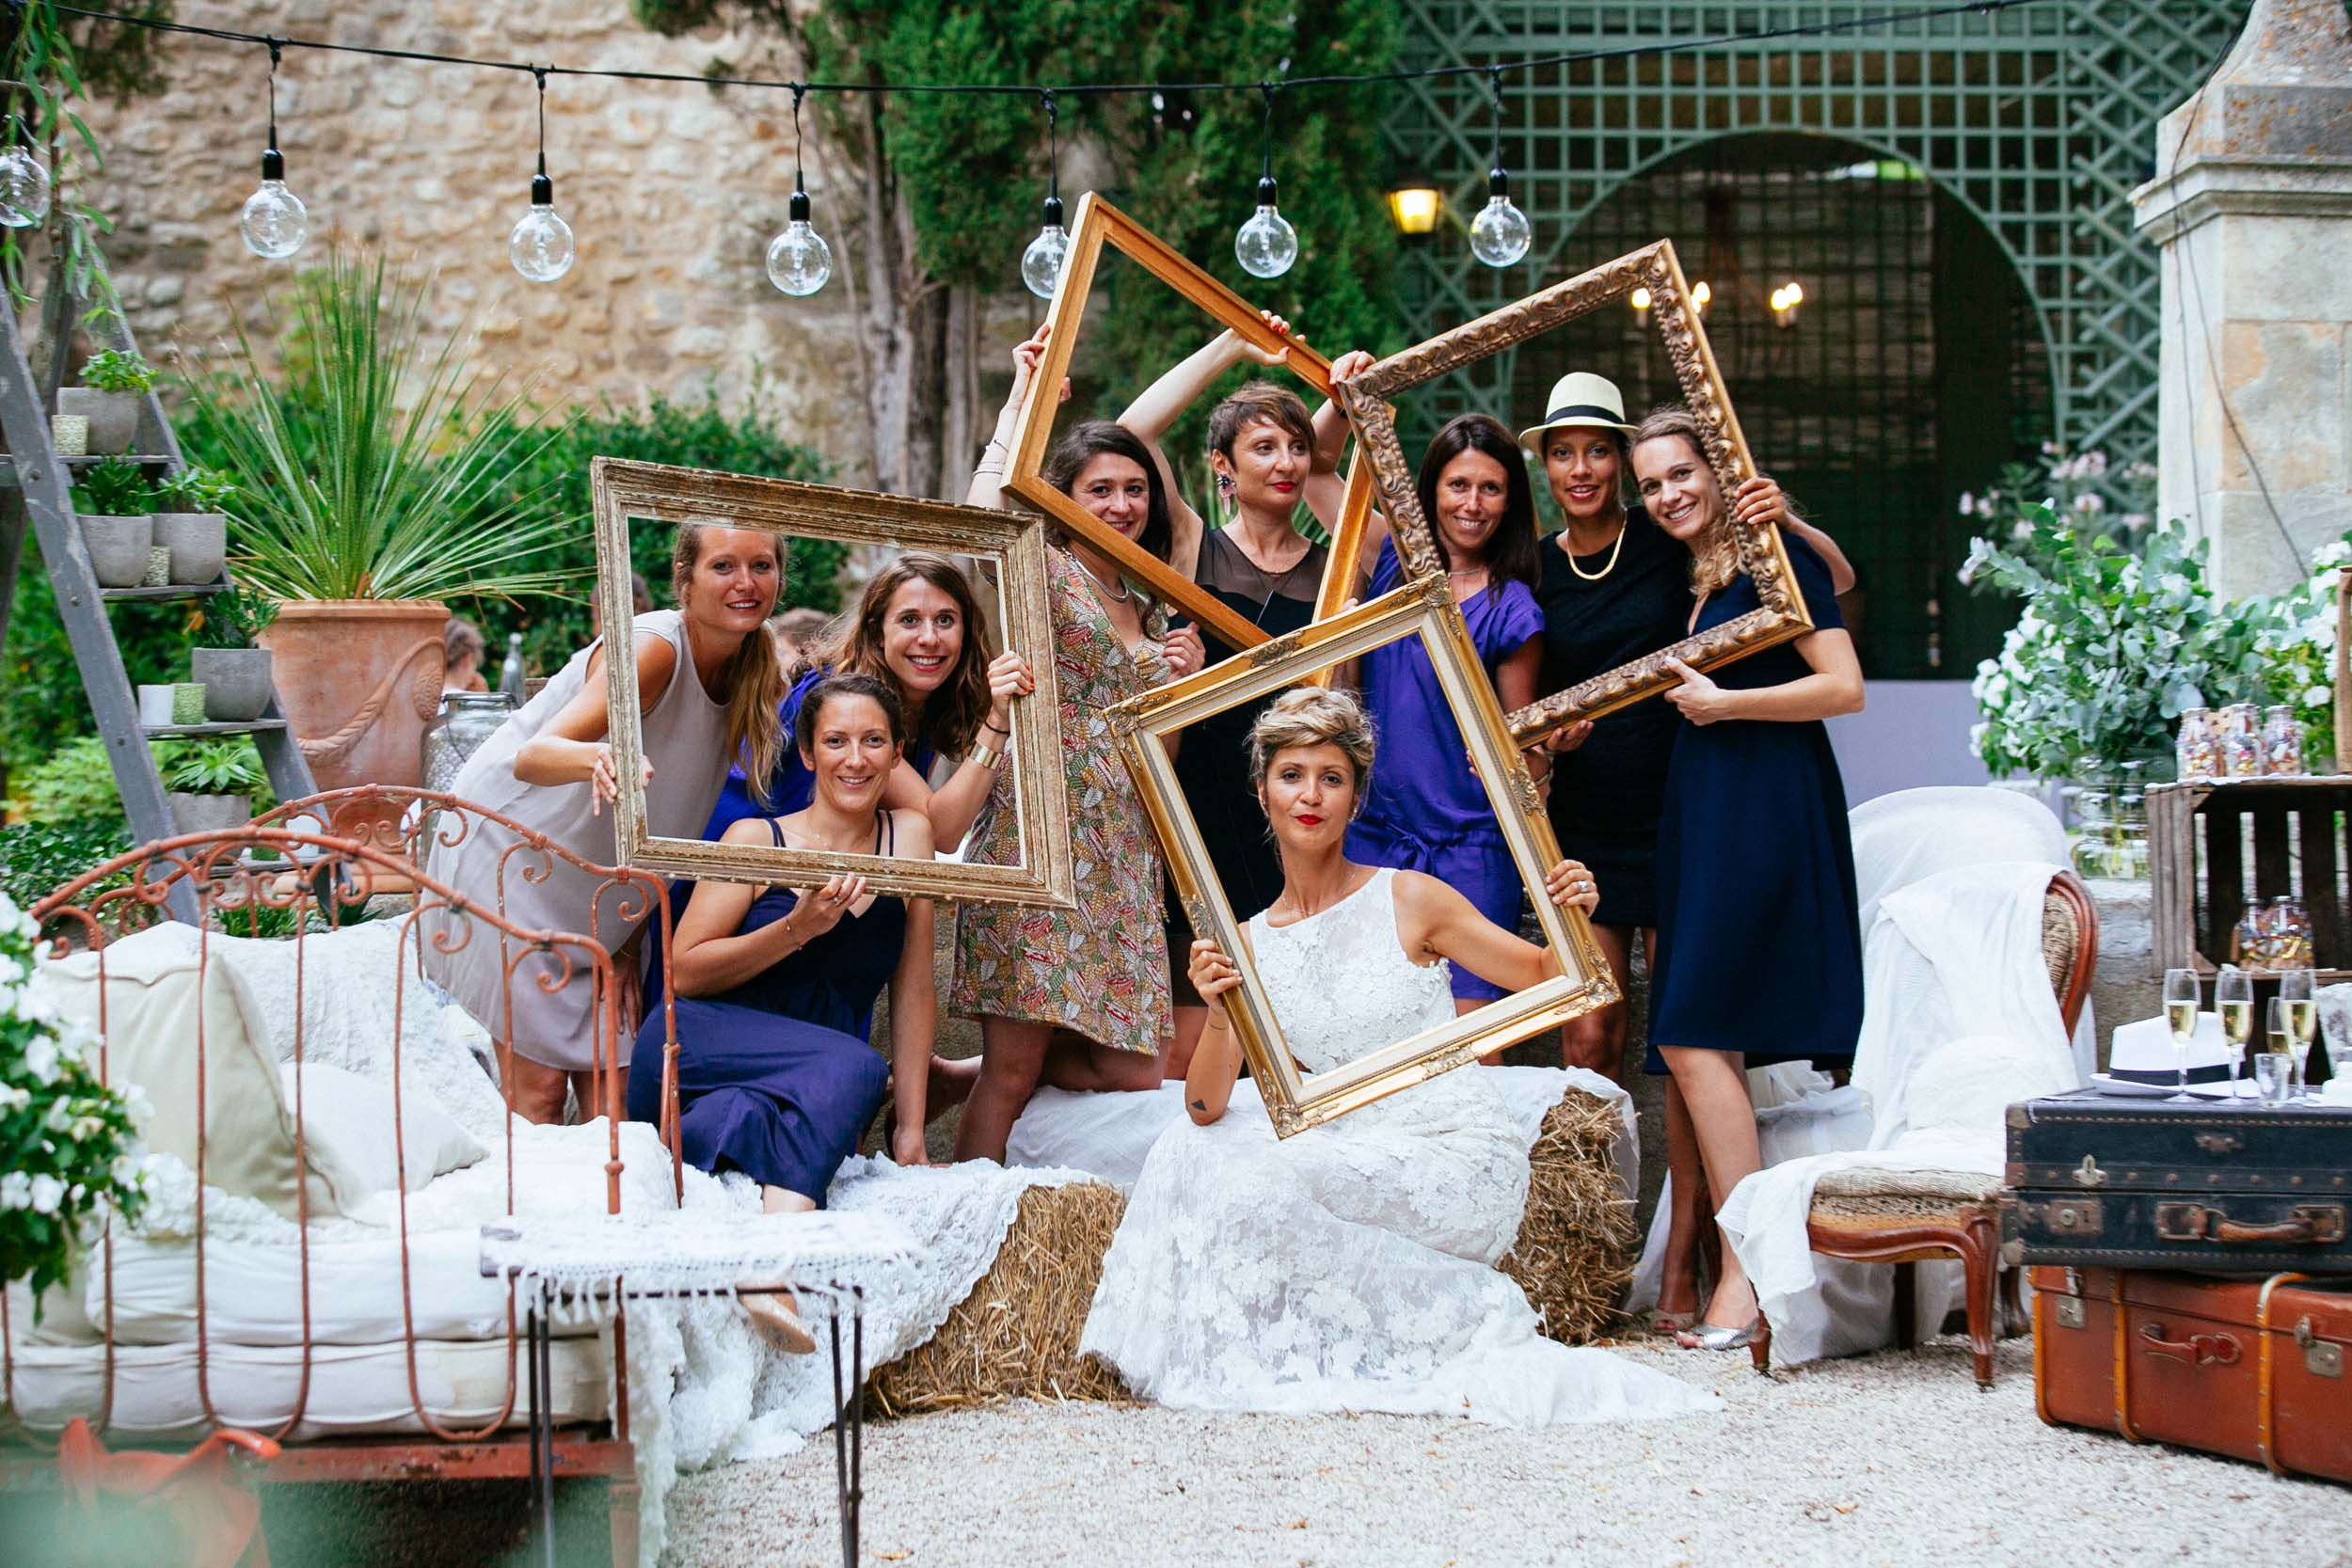 ALexKa_wedding_mariage-8995.jpg